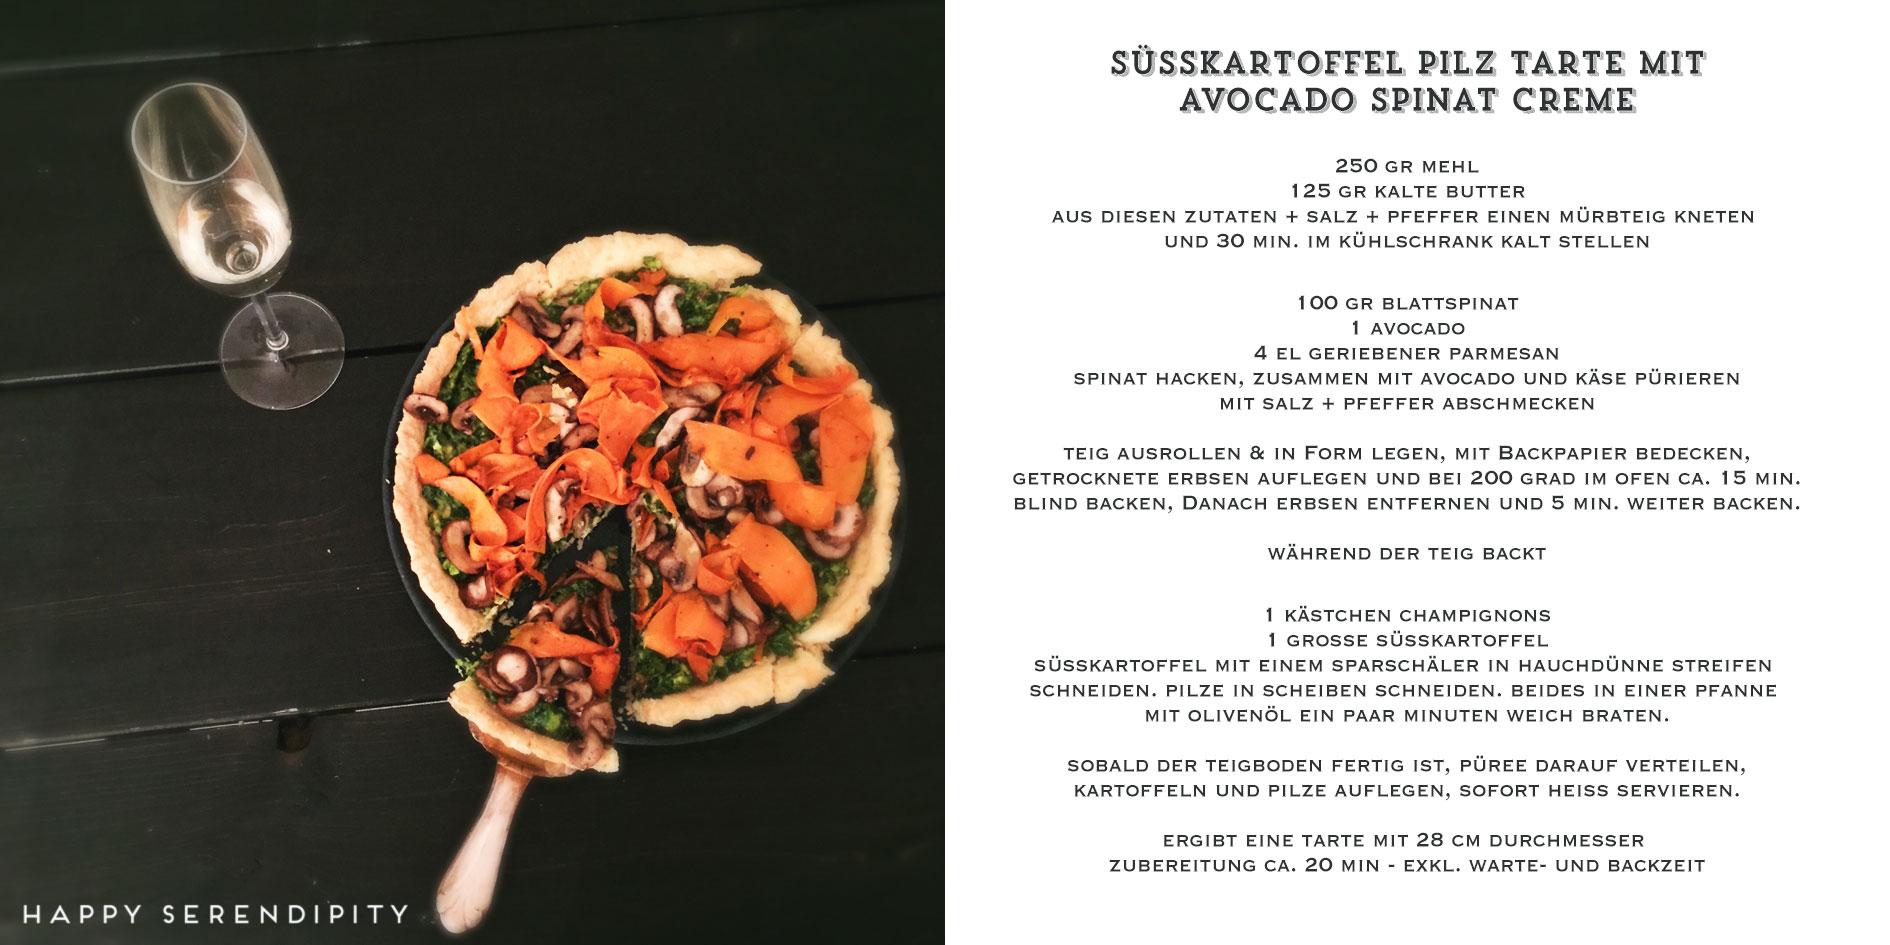 happy serendipity kocht veggie, rezept süßkartoffel pilz tarte mit avocado spinat creme